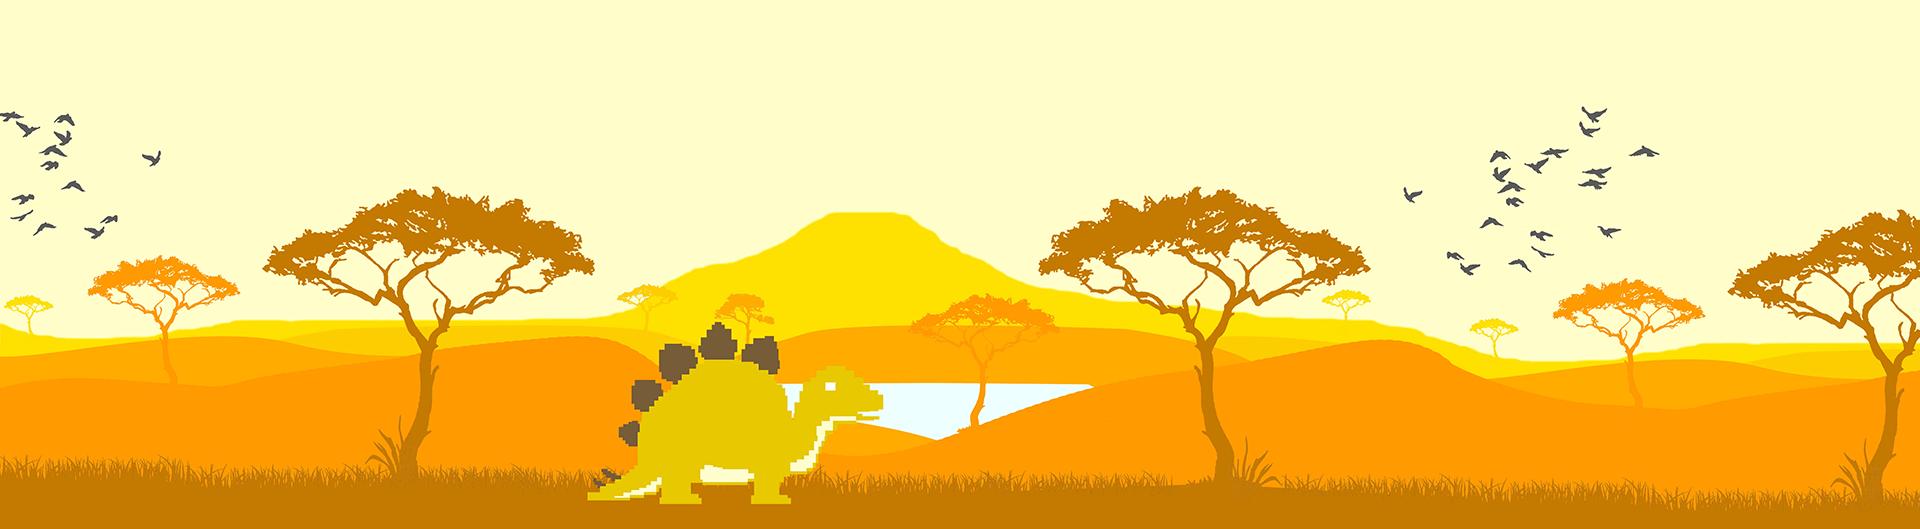 Vertalen dienst banner - Digital Dinosaurs